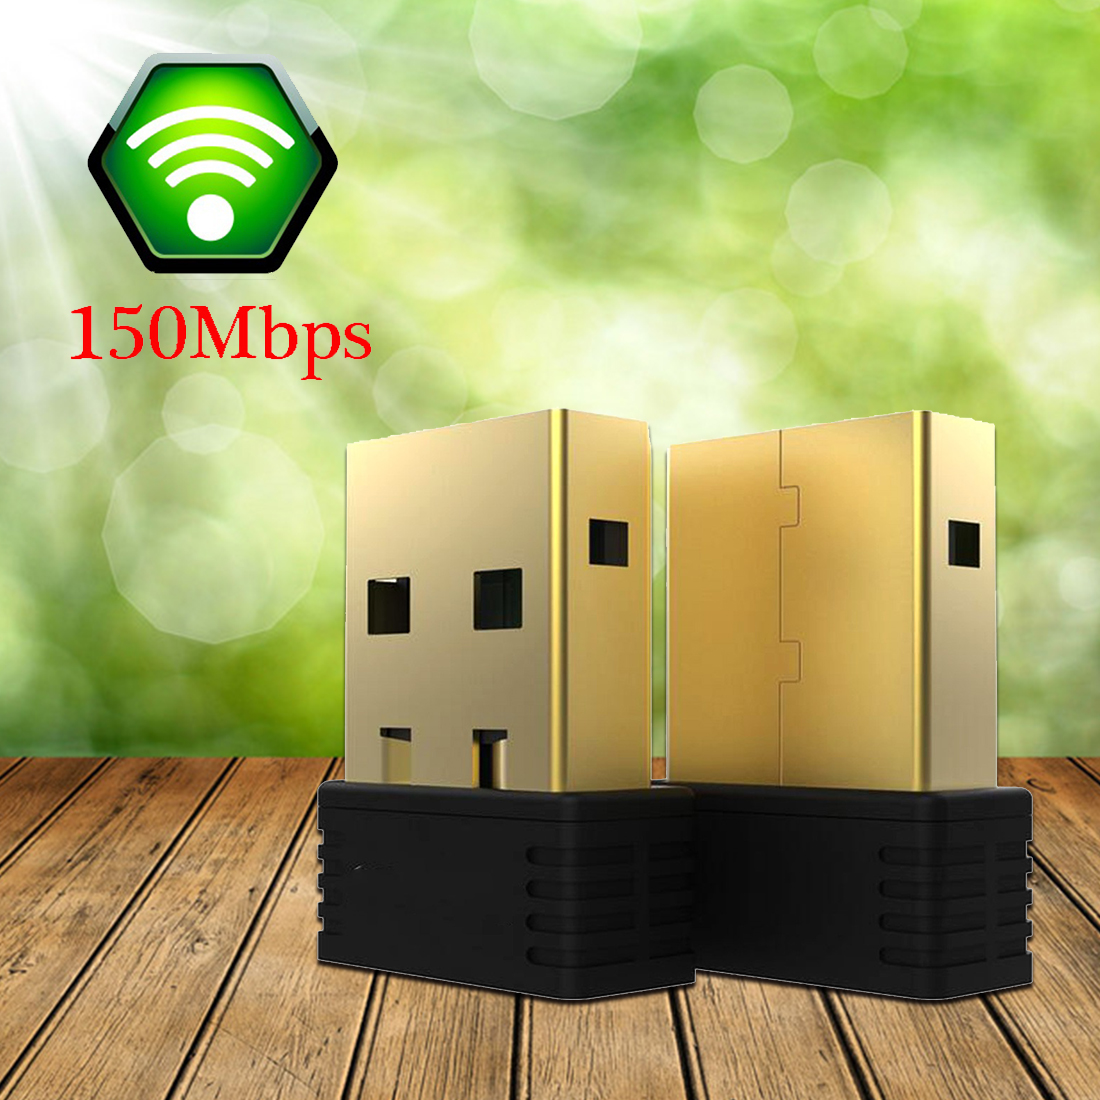 NOYOKERE 150Mbps Nano Wireless USB WiFi adapter Adaptador WiFi Dongle Network Card 802.11n / g / b LAN